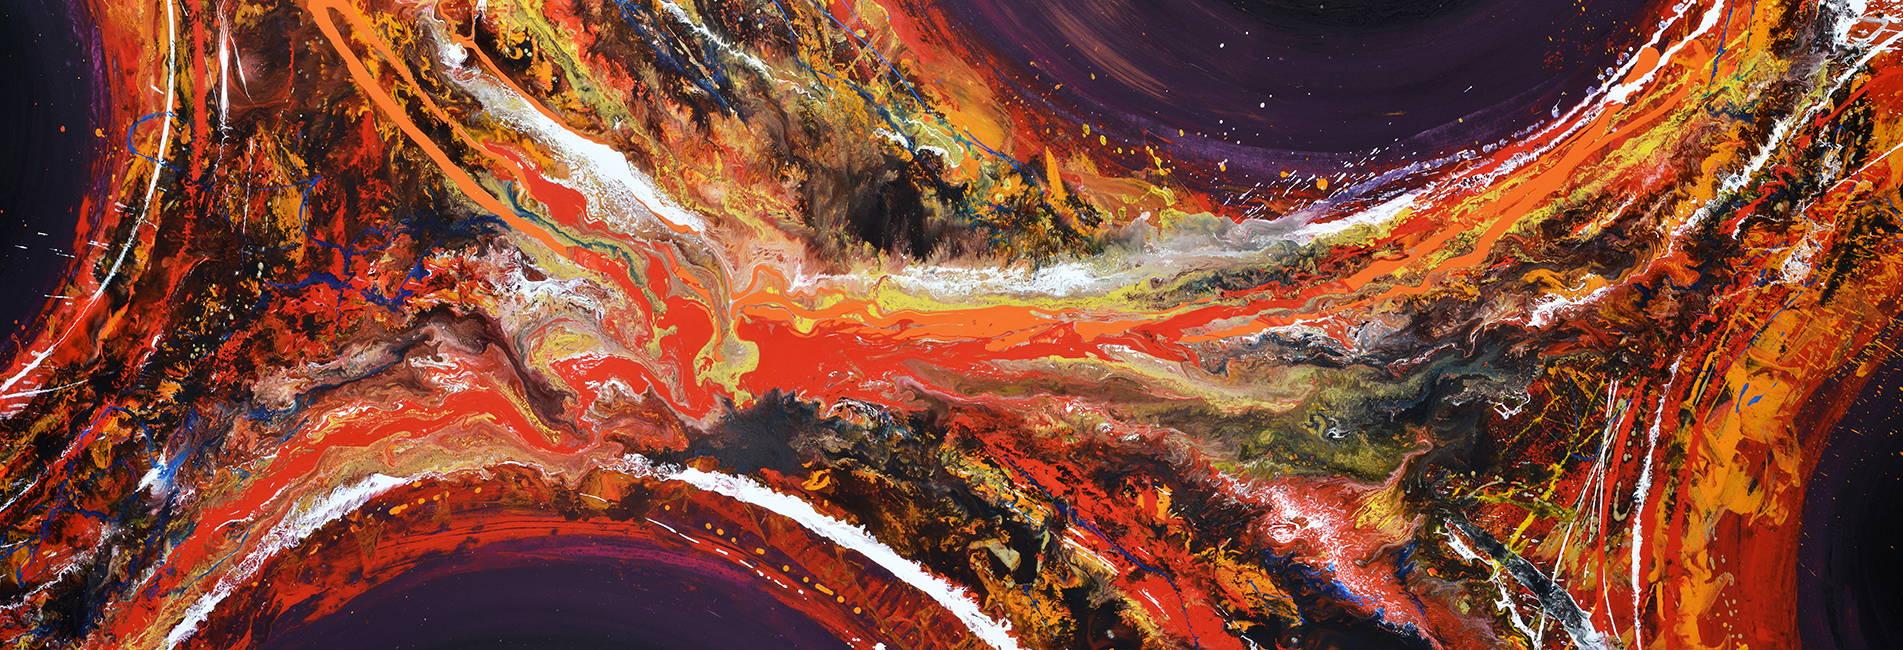 Requiem Art by Swarez